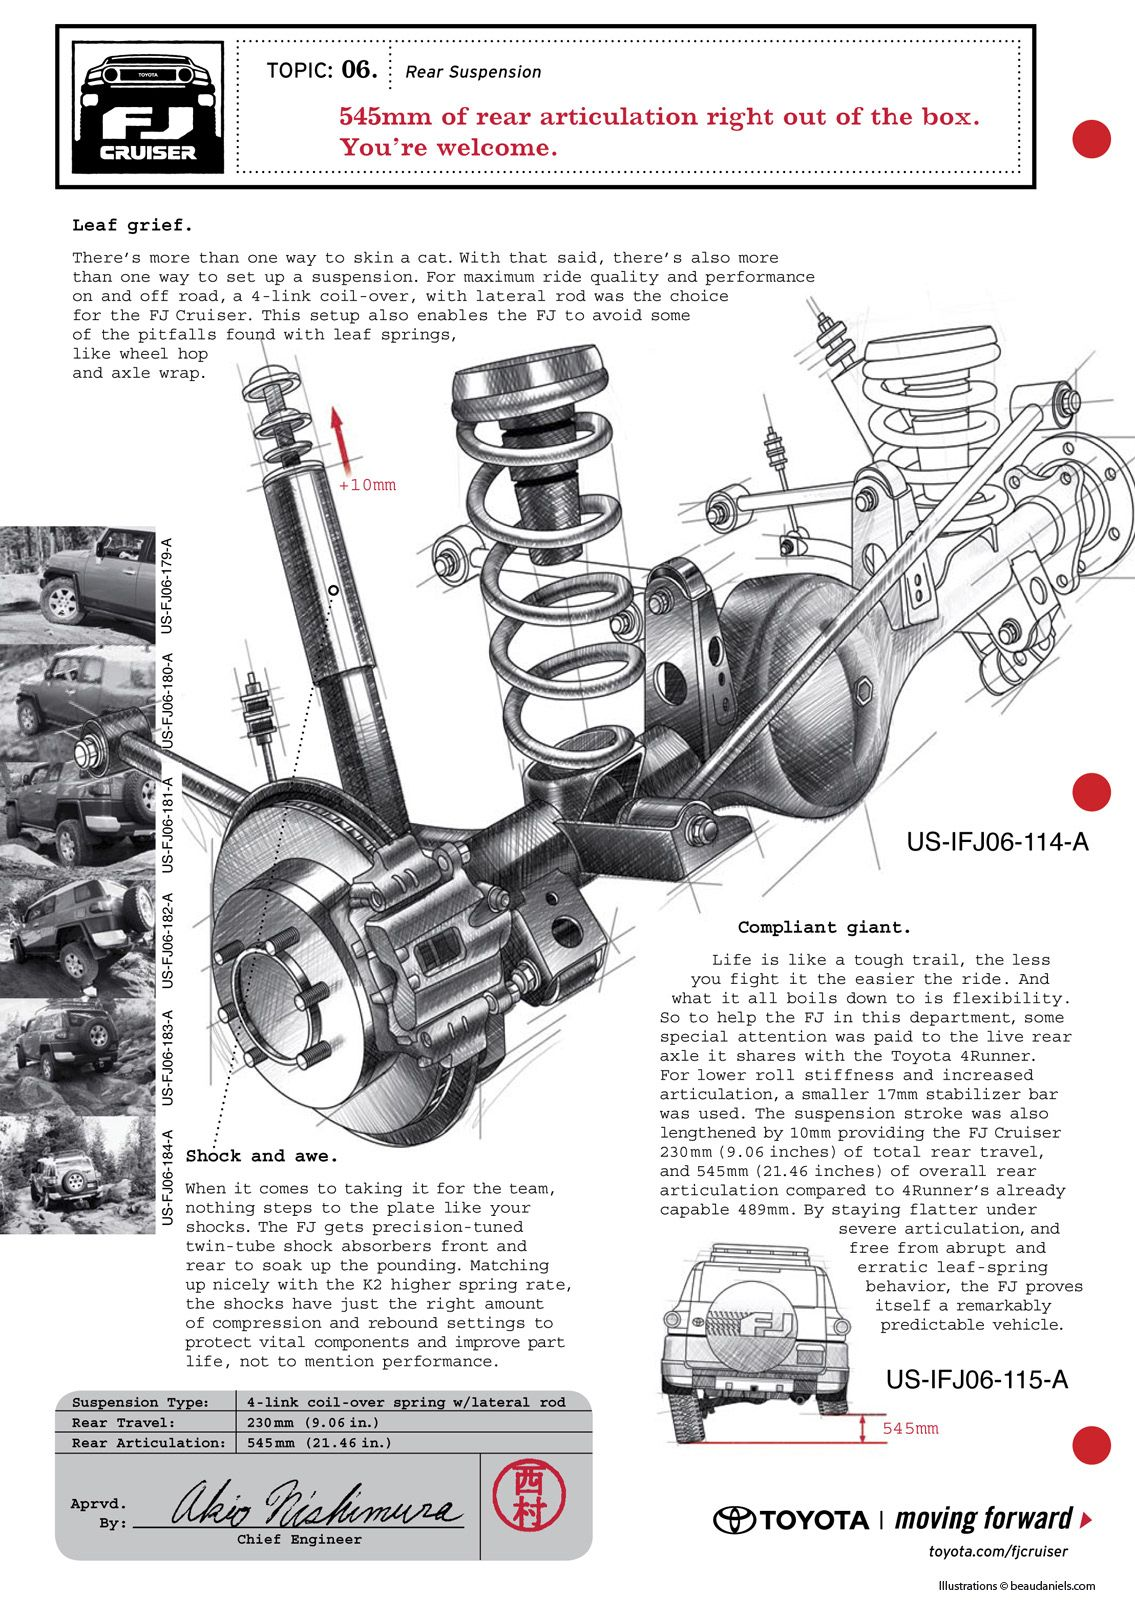 Fj Cruiser Trailer Wiring Diagram